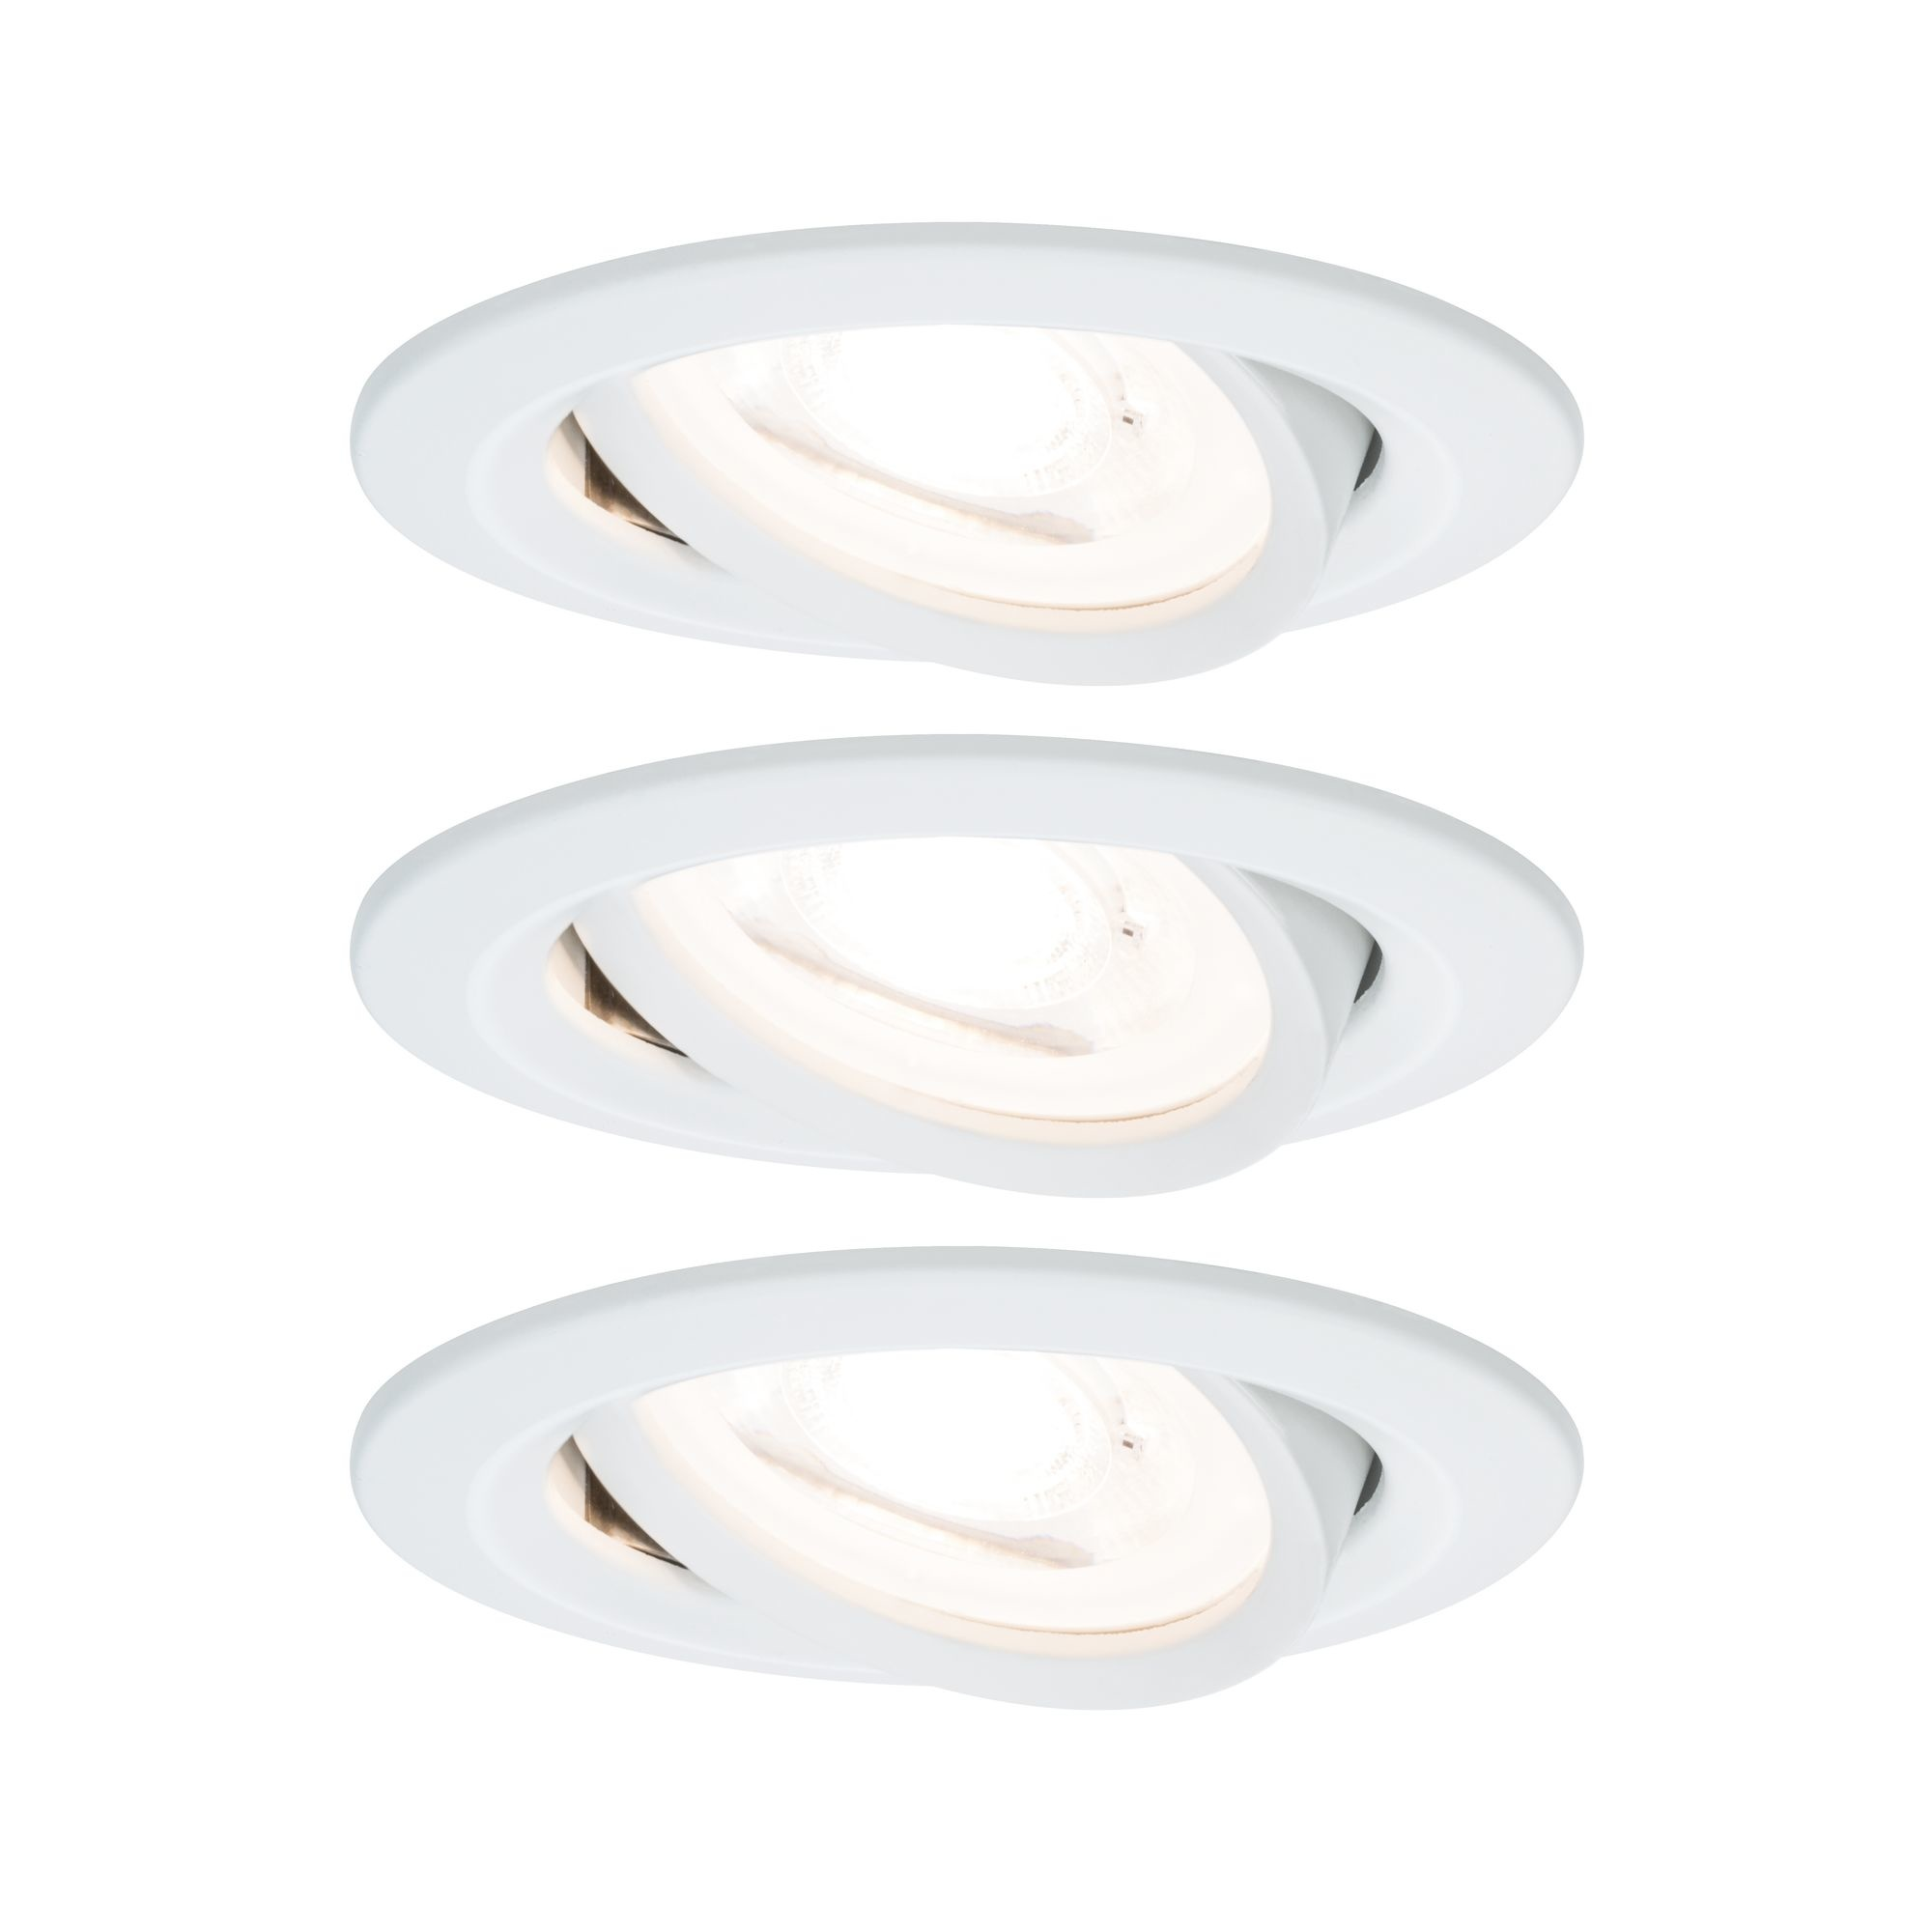 Paulmann EBL Set Nova rd schw LED 3stepdim 3x6,5W230V GU10 51mm Weiß matt/Alu